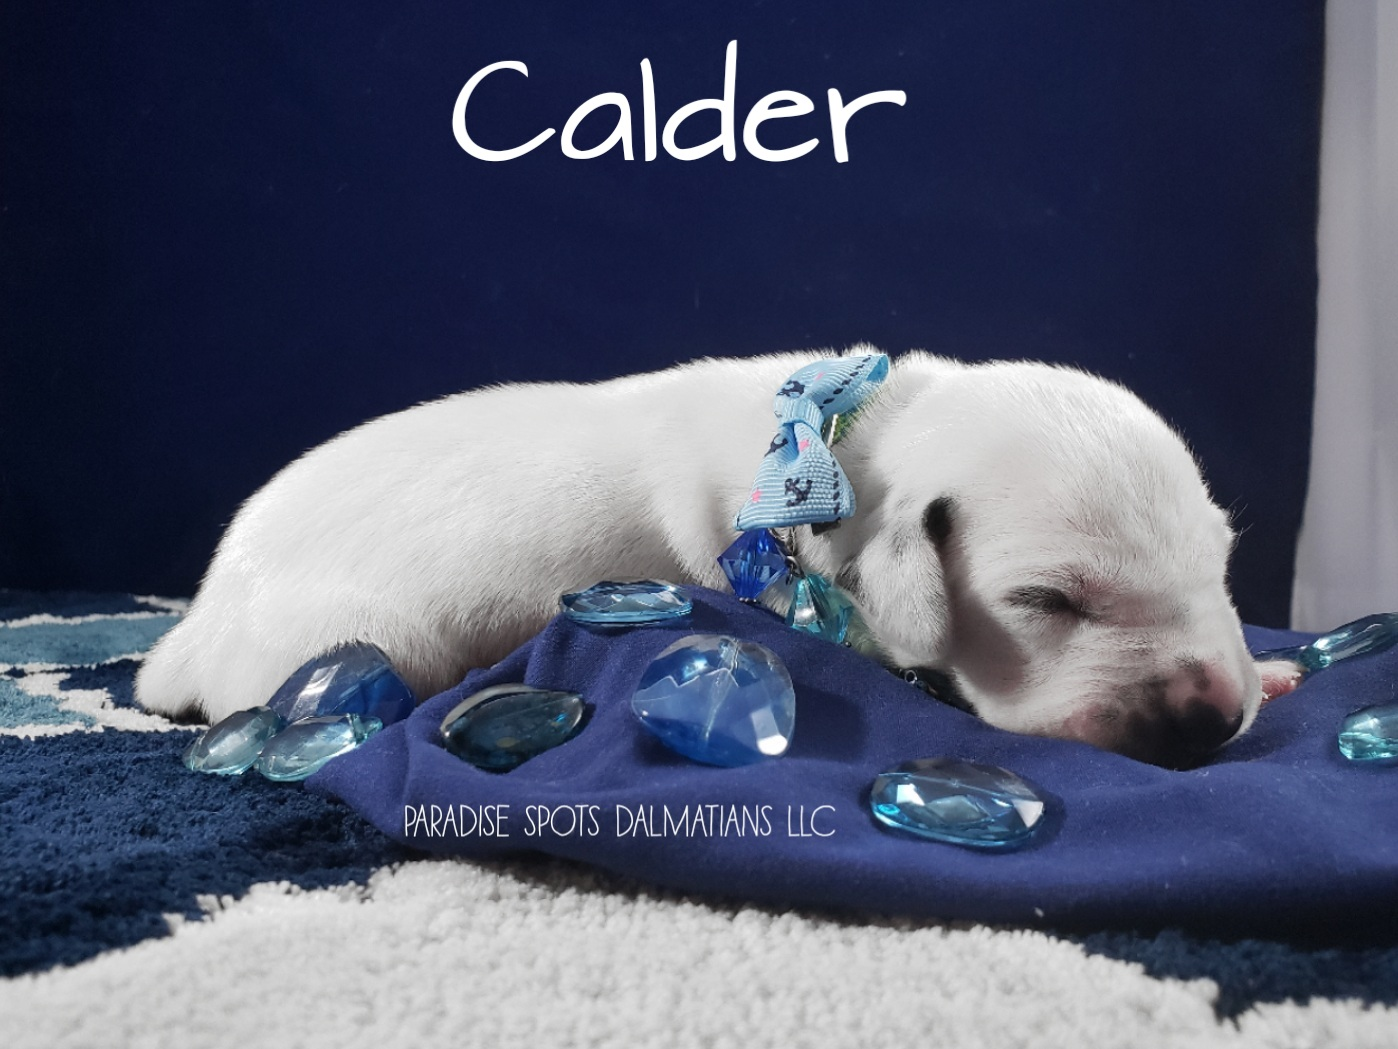 calder-1w (2)